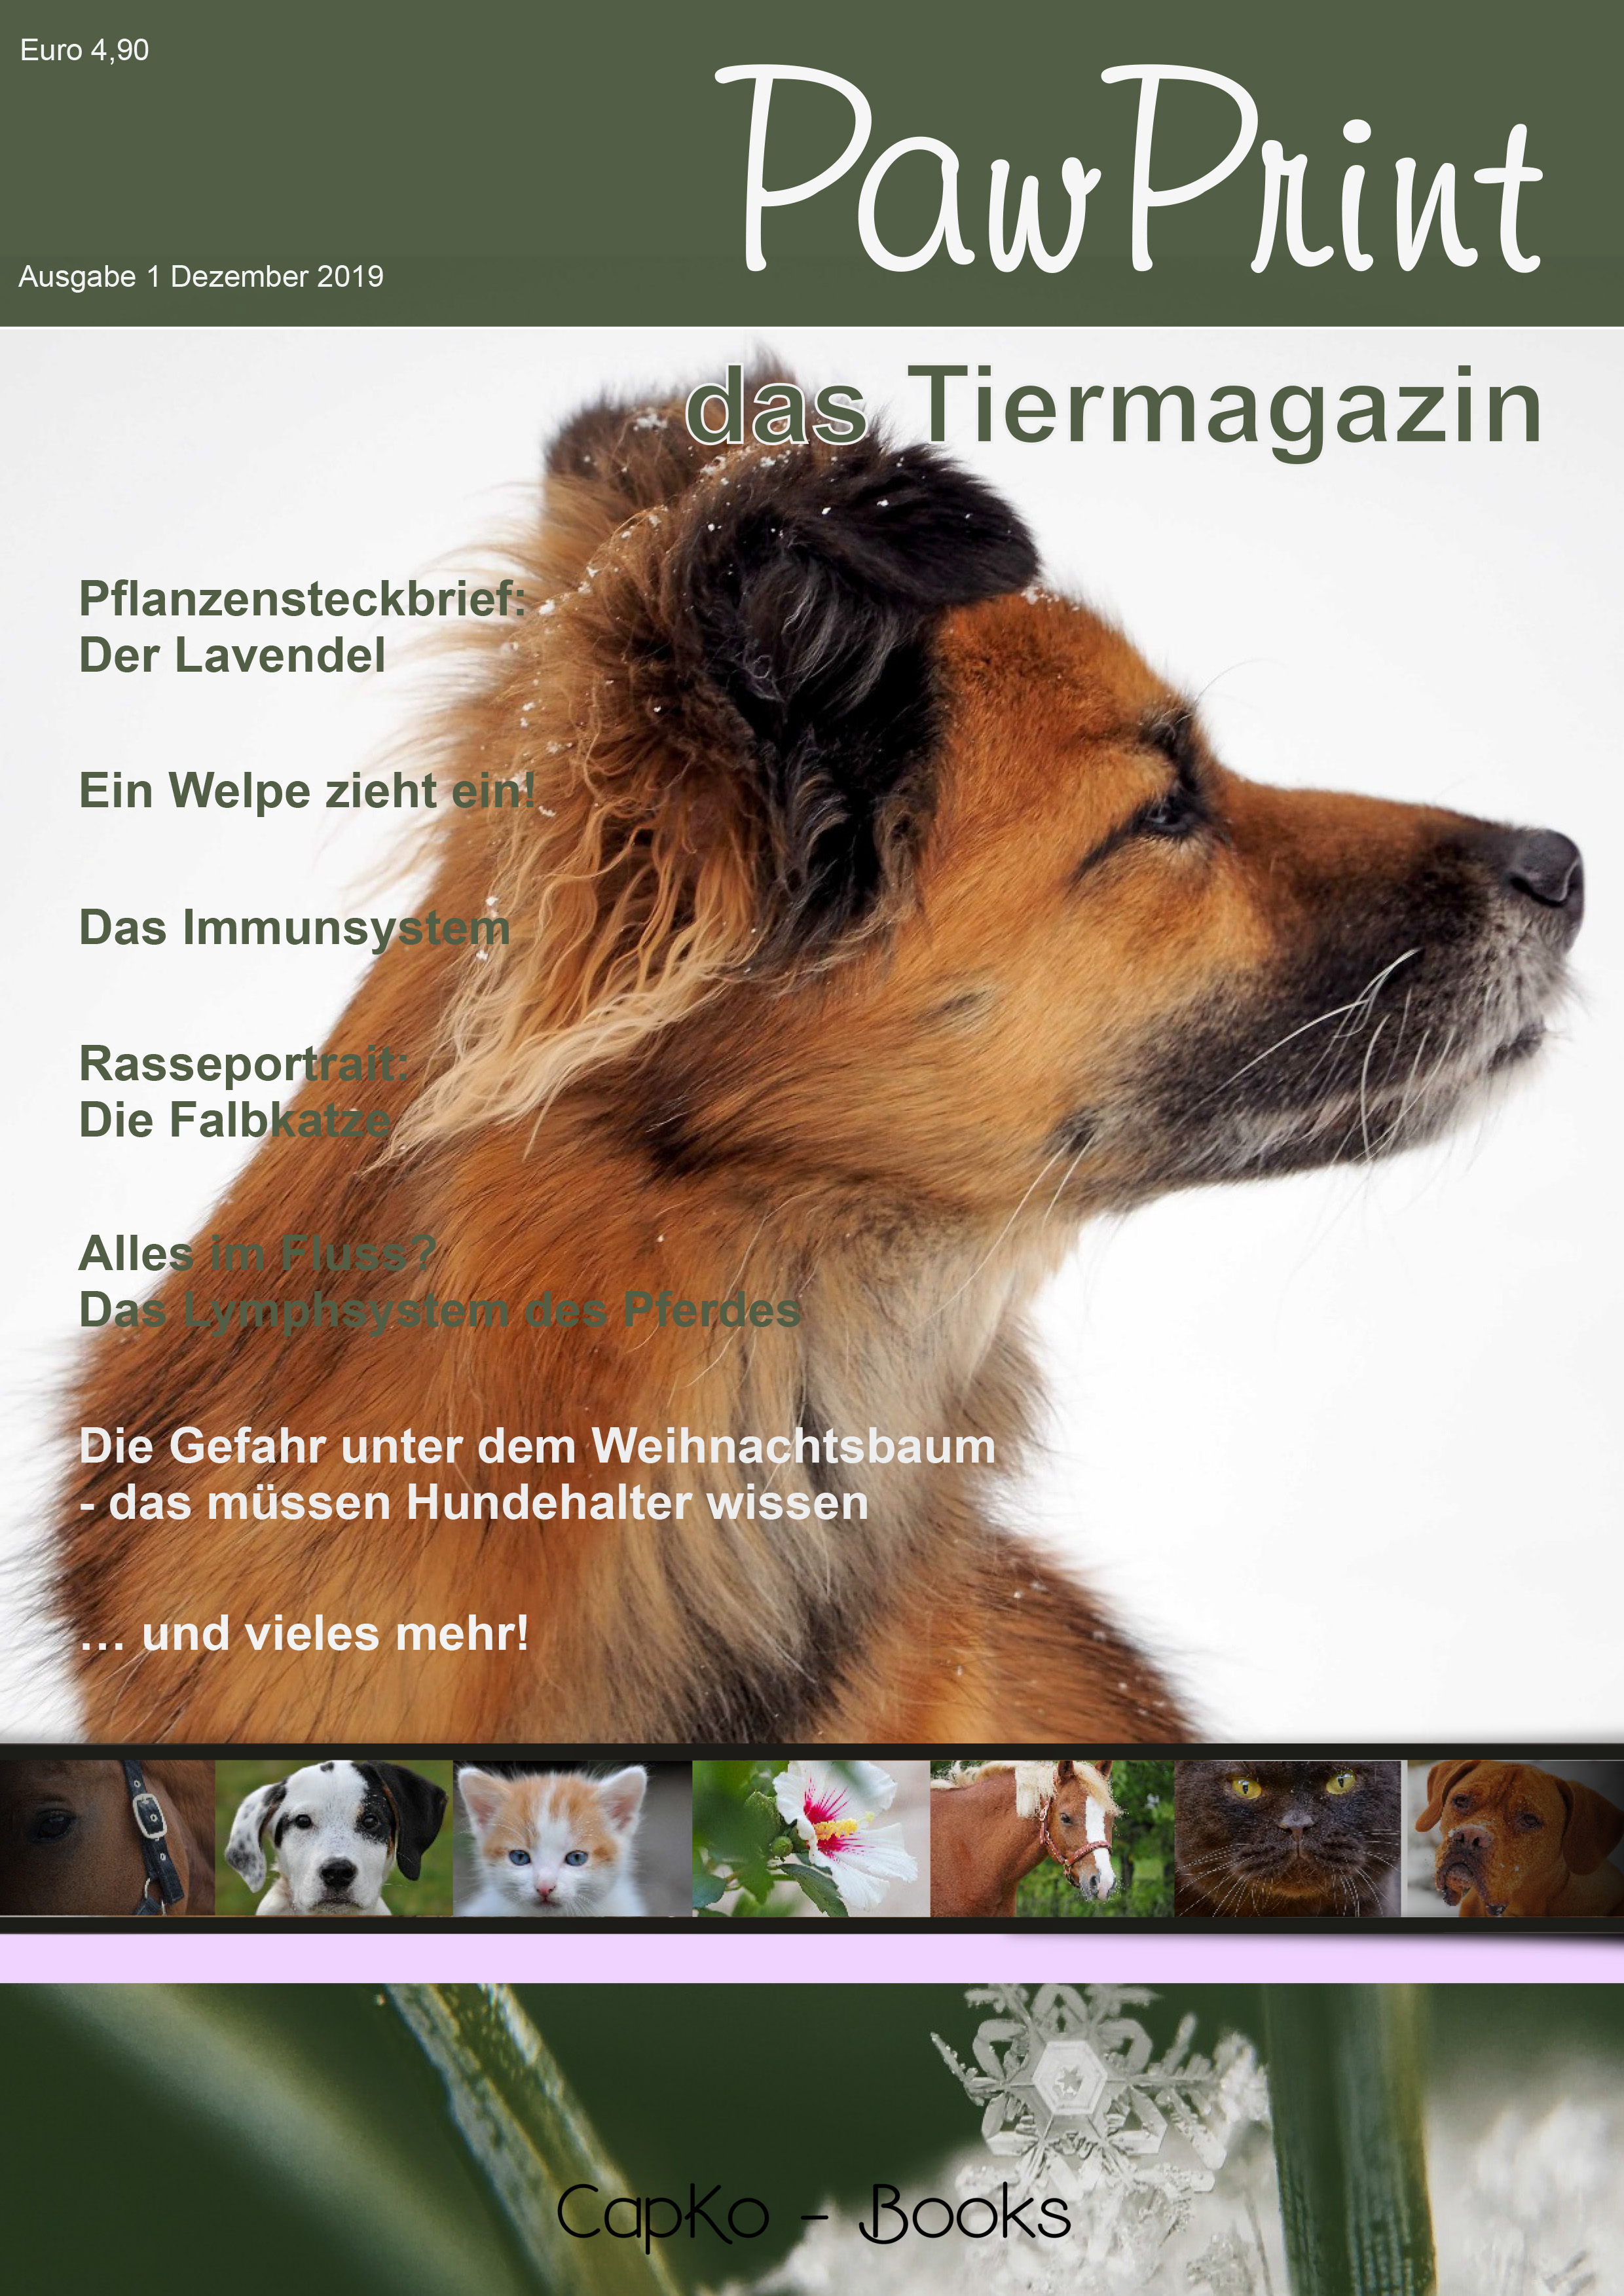 PawPrint - das neue Tiermagazin